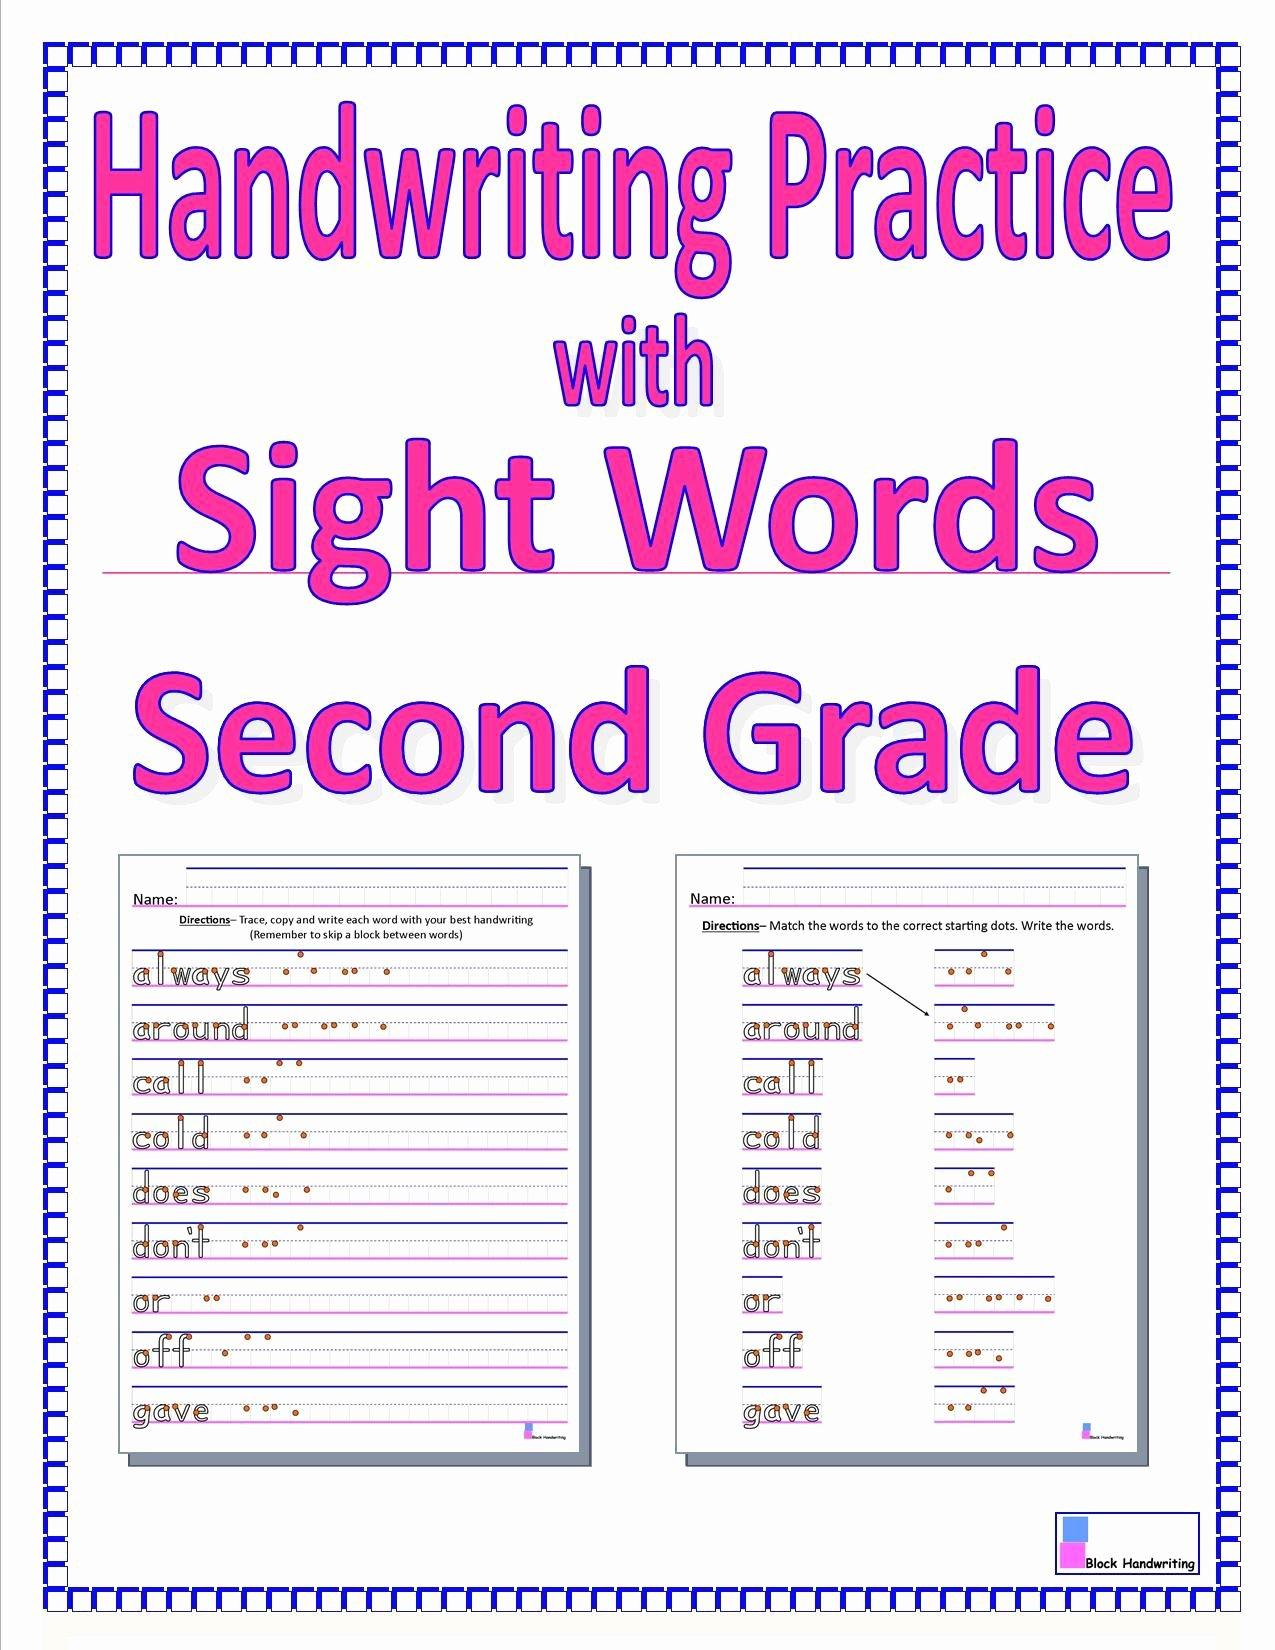 2nd Grade Sight Words Worksheet Best Of 2nd Grade Sight Words